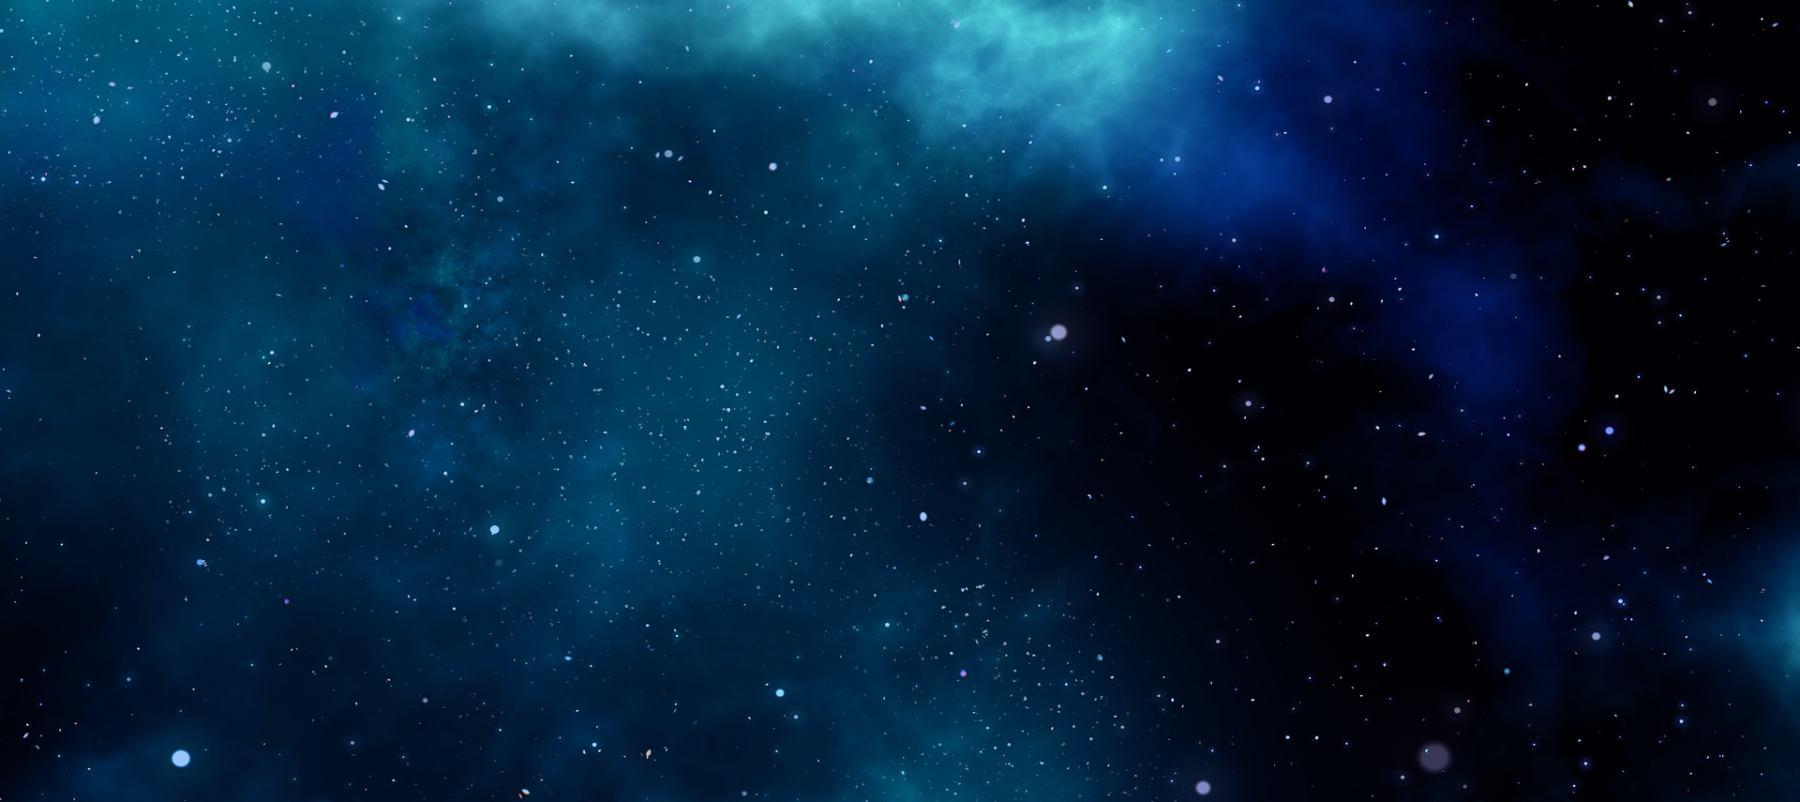 universe-1566159_1920